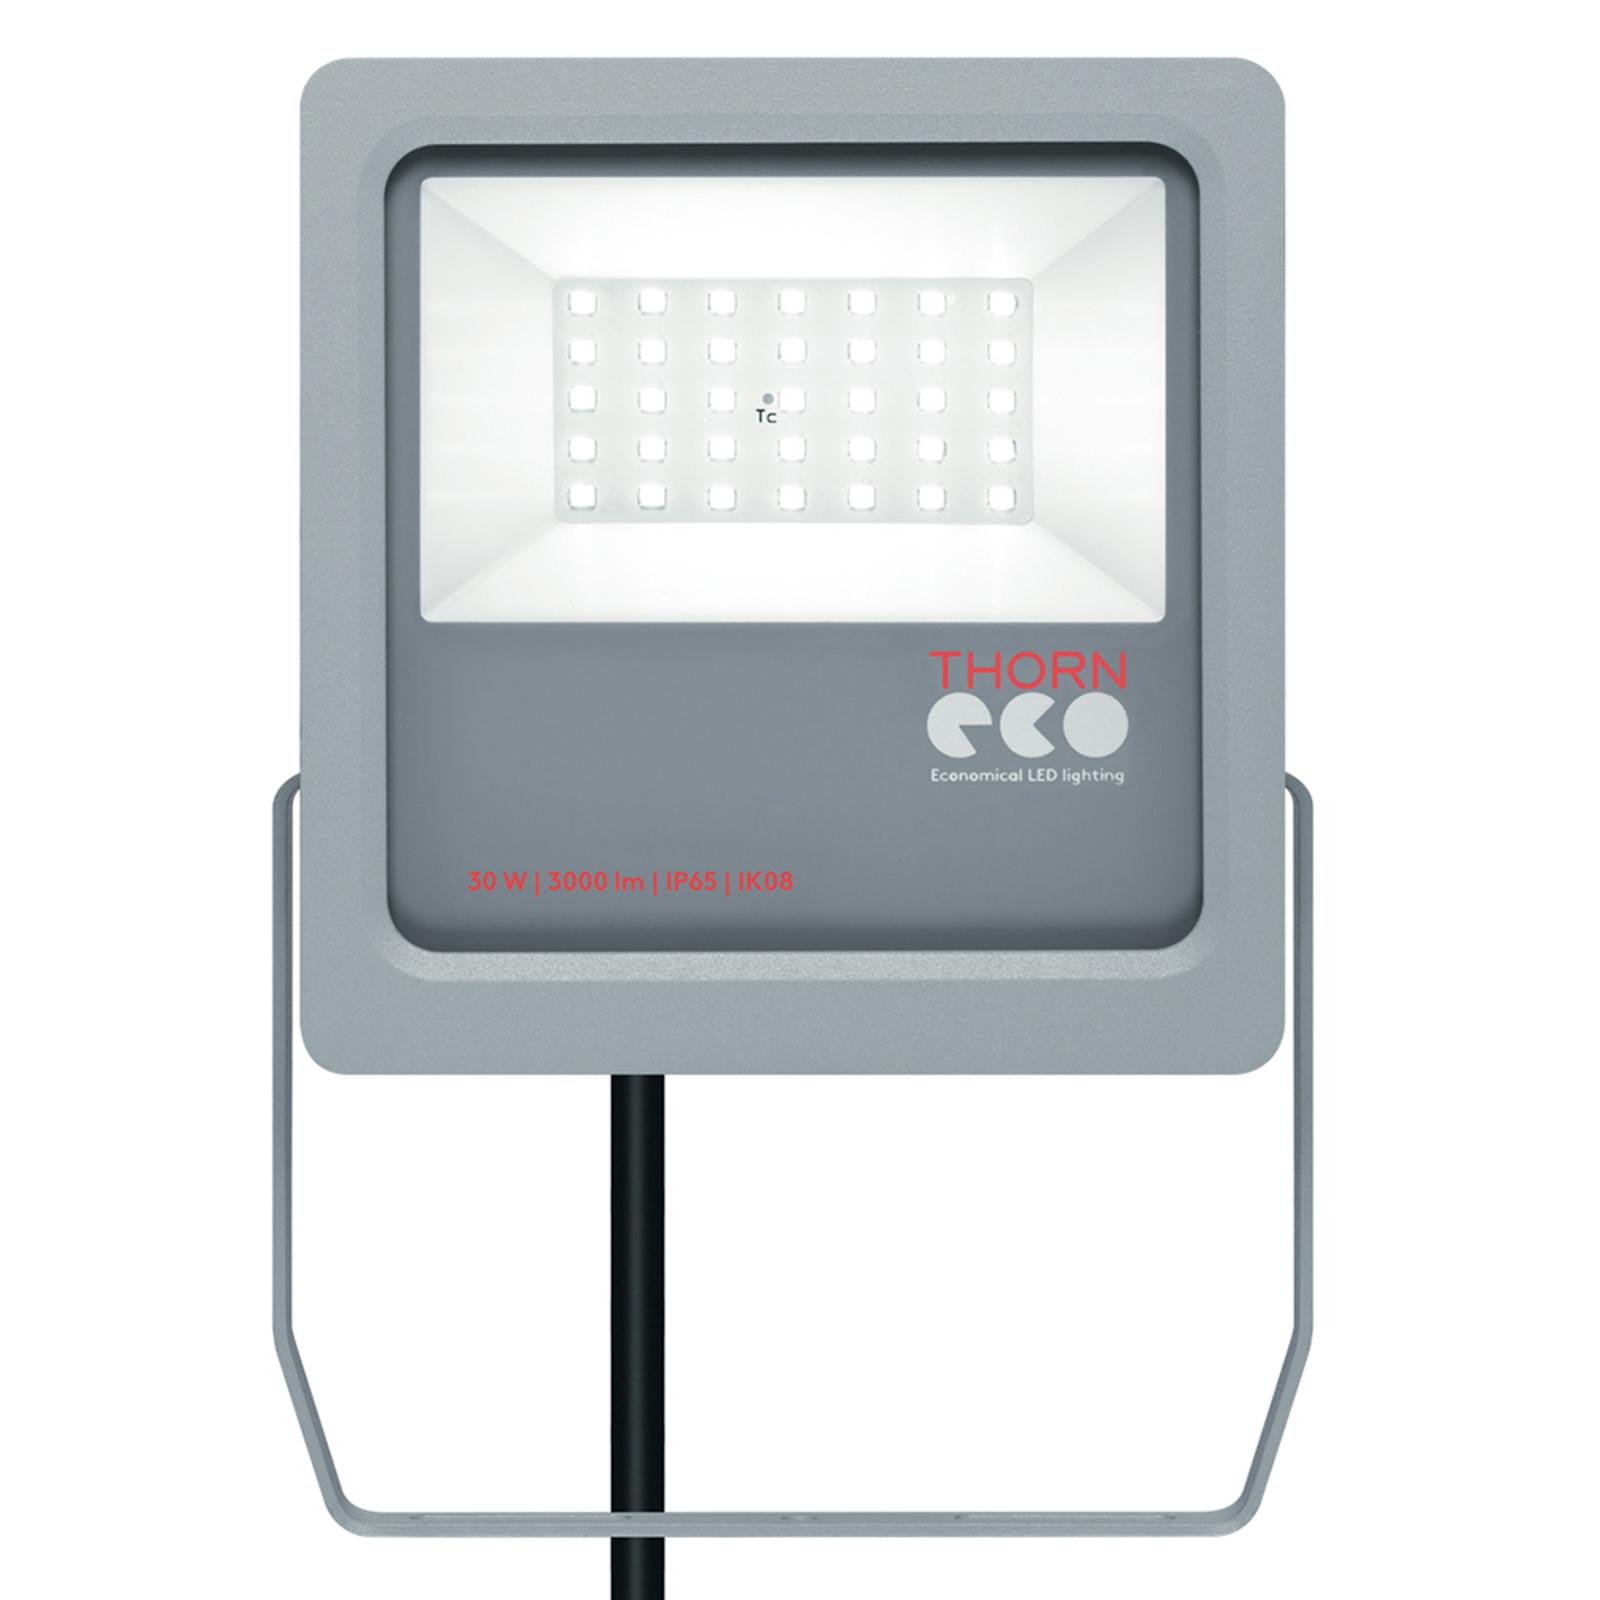 THORNeco Leonie LED-Strahler IP65 4.000 K 30 W